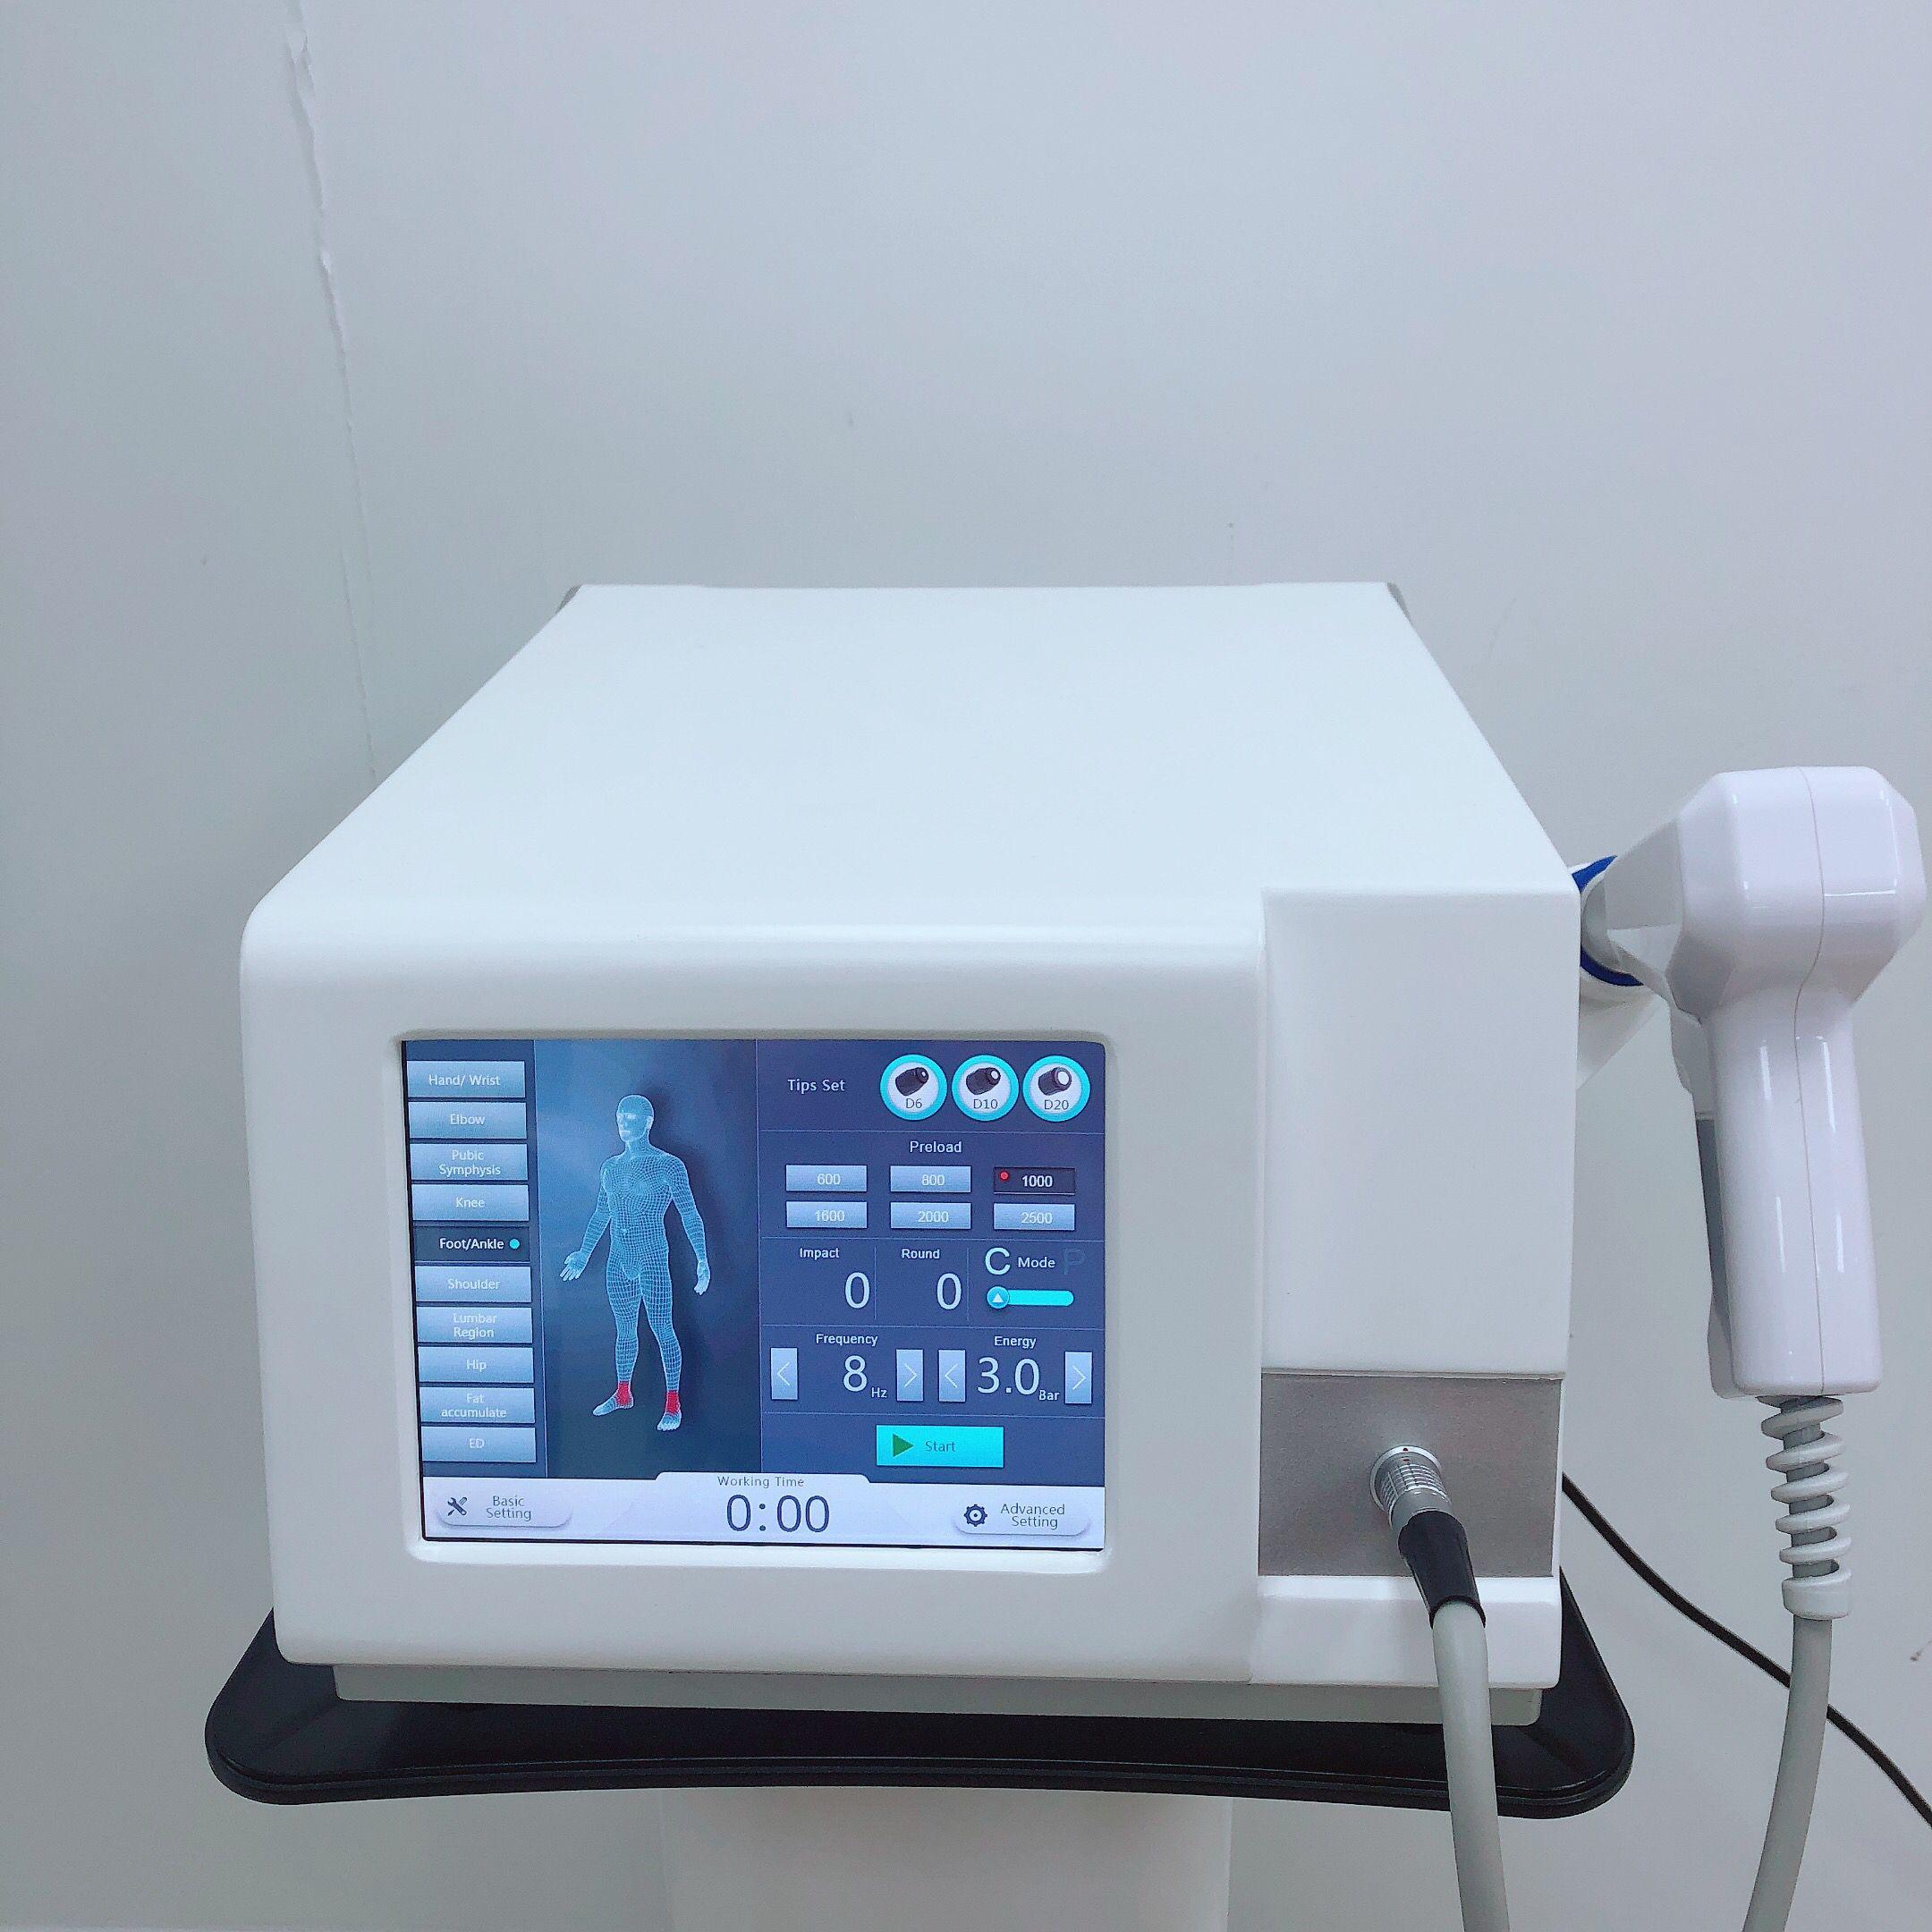 Phycial onda de choque inicial Use beleza máquina ESWT ExtracorporealShock terapia por ondas RSWT Radial Shock Wave para a dor corporal alívio tratamento ed